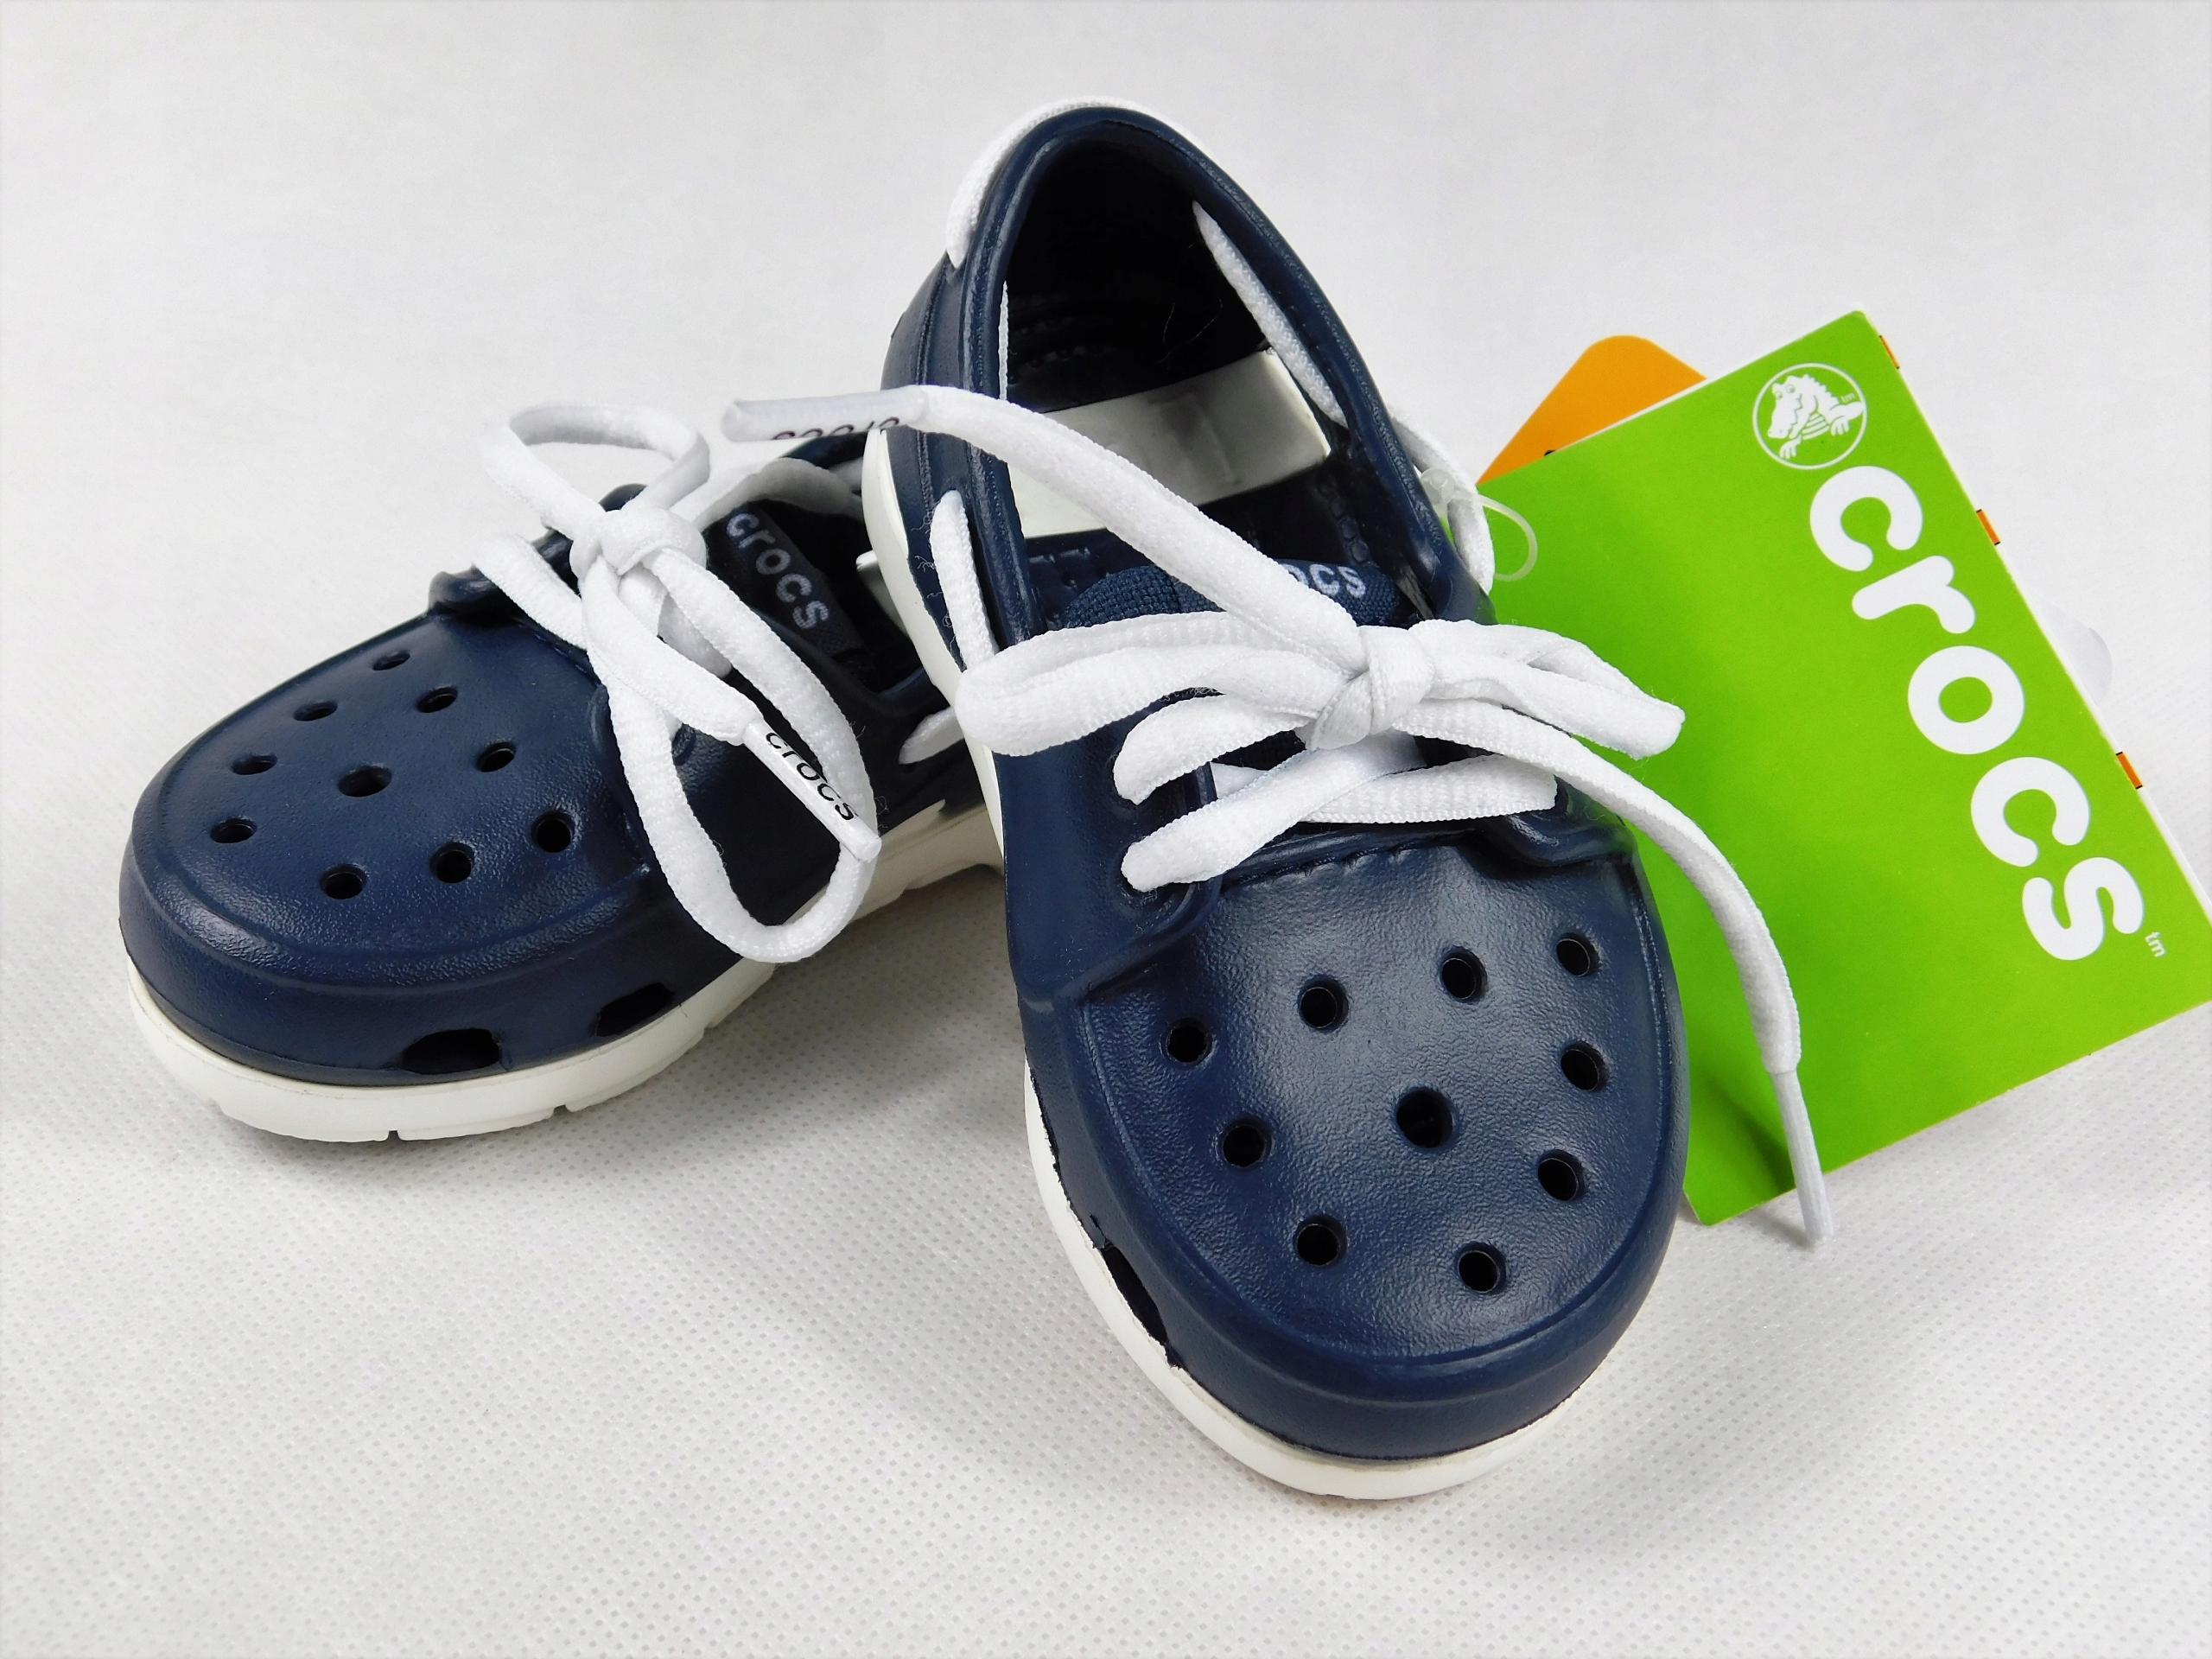 crocs buty beach line boat c6 22-23